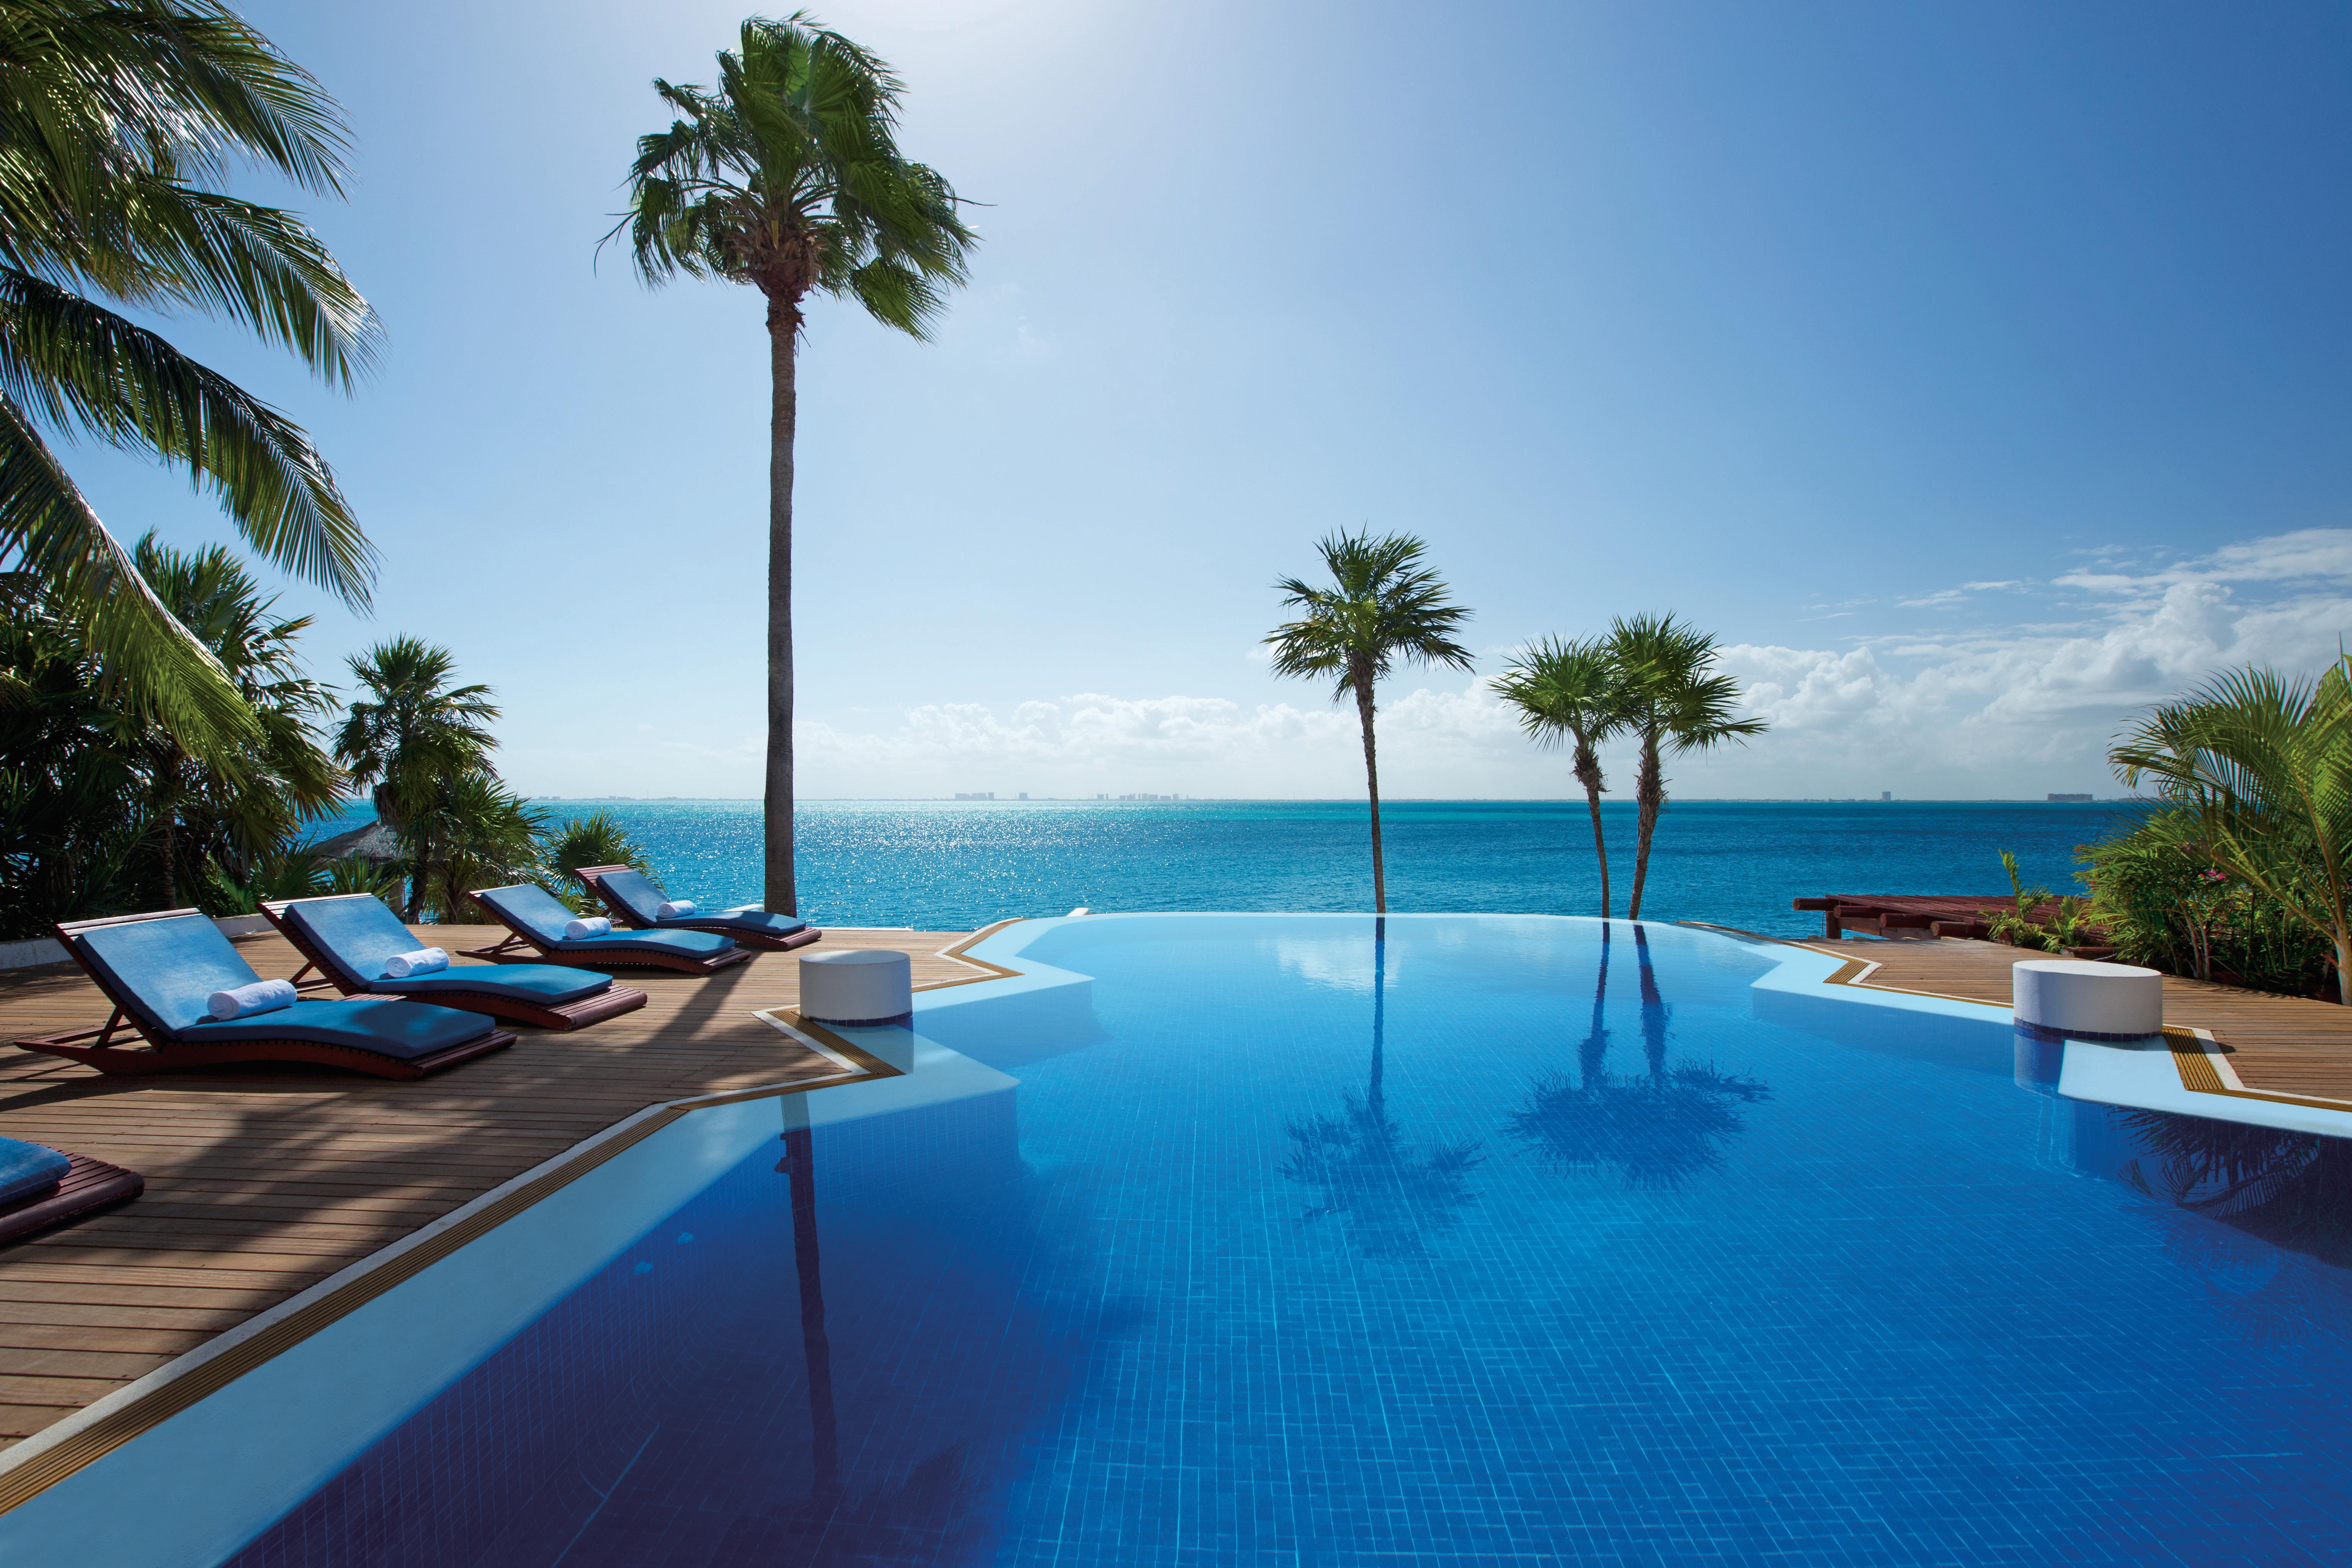 Travel Agency All-Inclusive Resort Zoetry Villa Rolandi Isla Mujeres Cancun 07